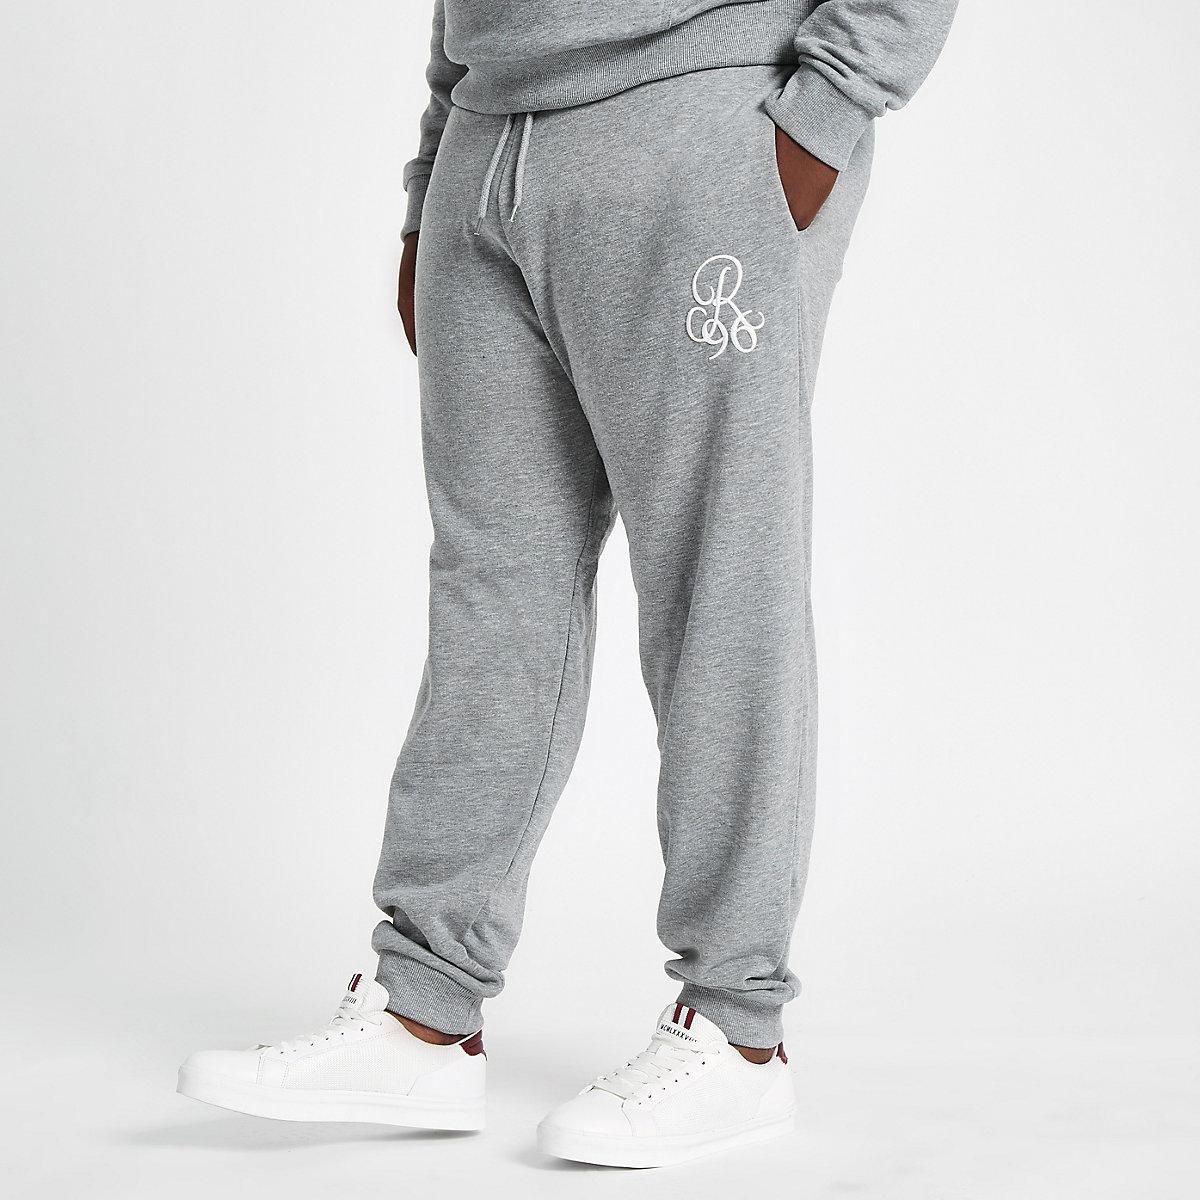 Big and Tall grey slim fit R96 joggers